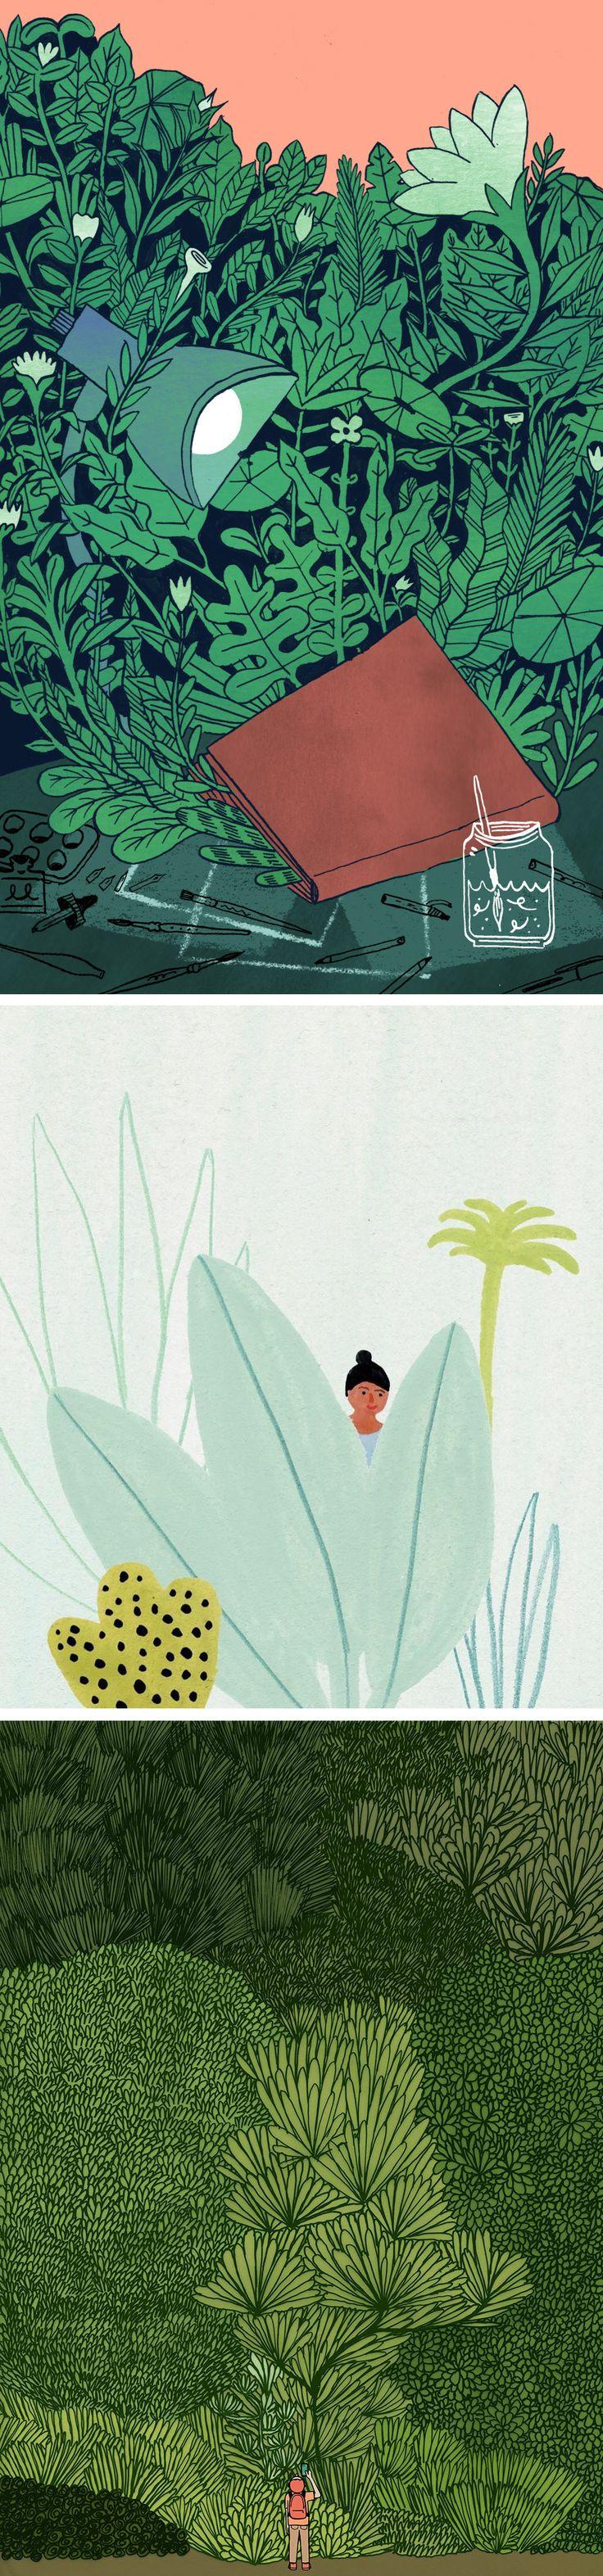 Green illustrations // nature-inspired art